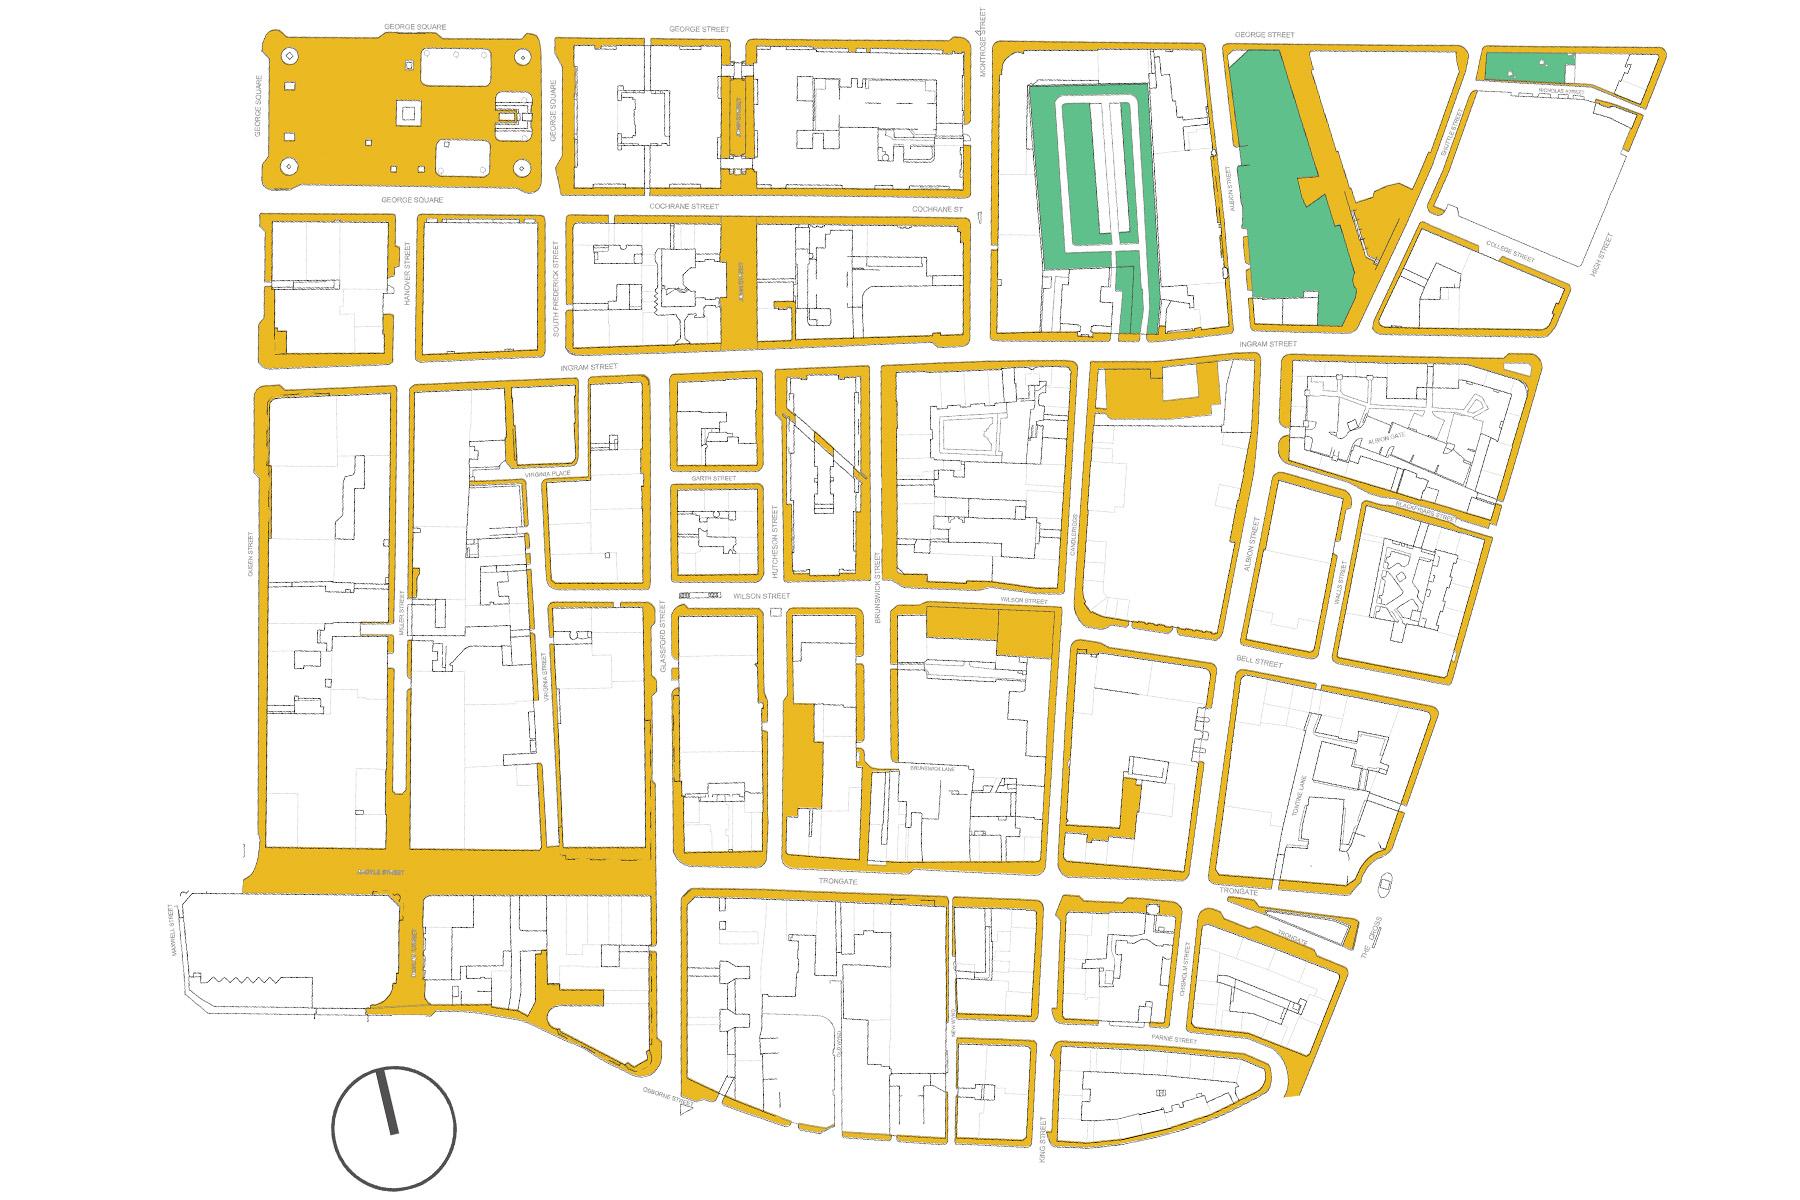 Streets of Merchant City